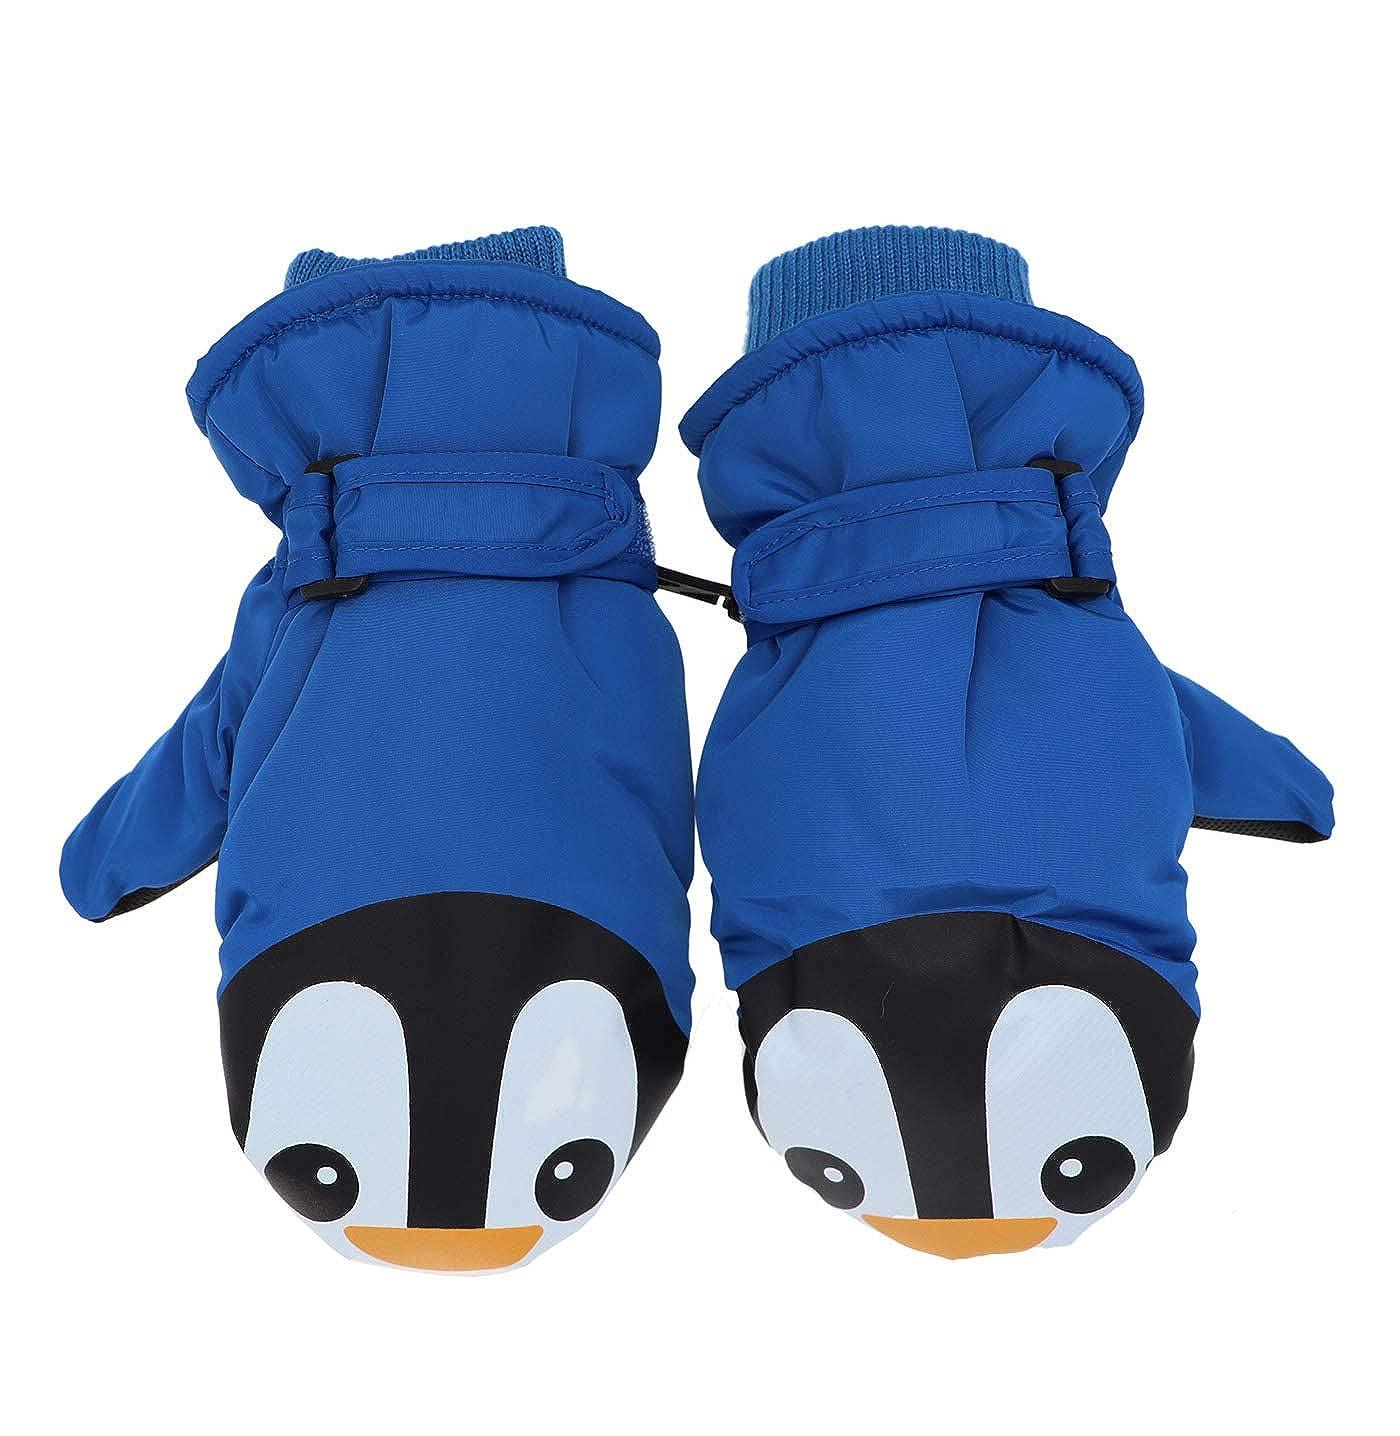 Kids Cute Penguin Gloves Mittens Winter Waterproof Ski Fleece Lined Snow Glove Thermal Warm Mitten for Boys Girls